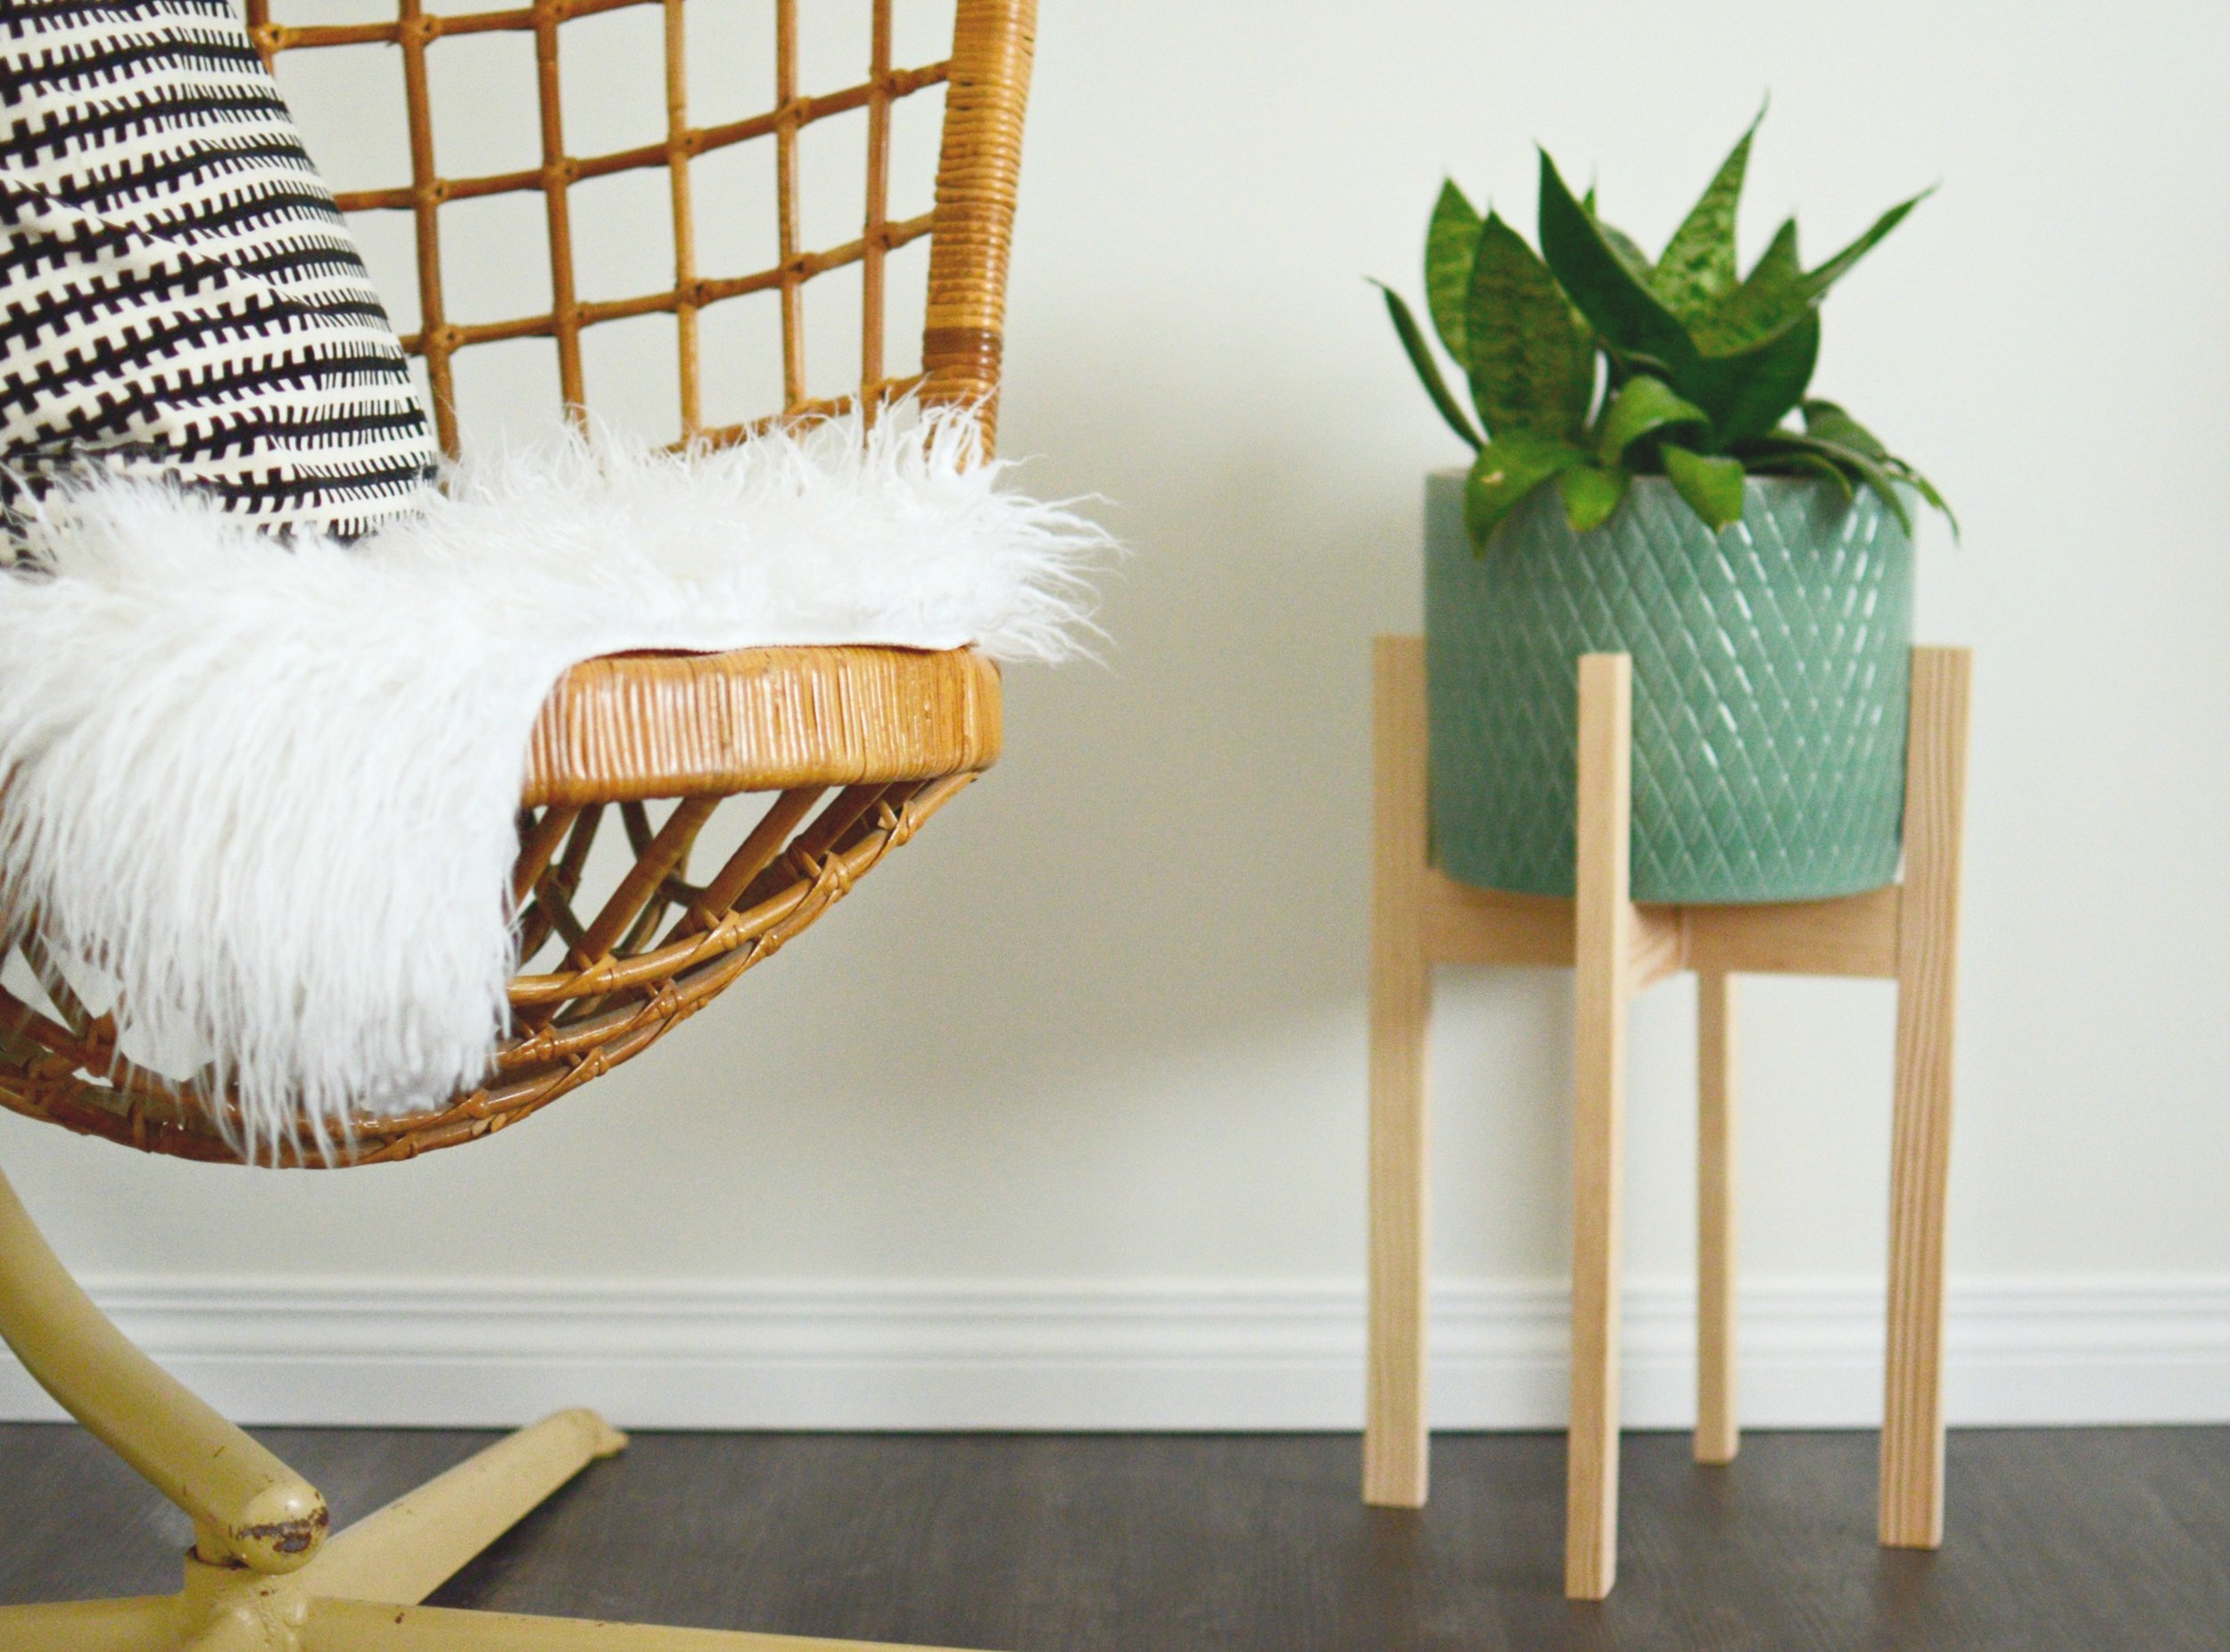 Calgary Interior Designer - Marlo Creative Interiors - Master Bedroom Makeover